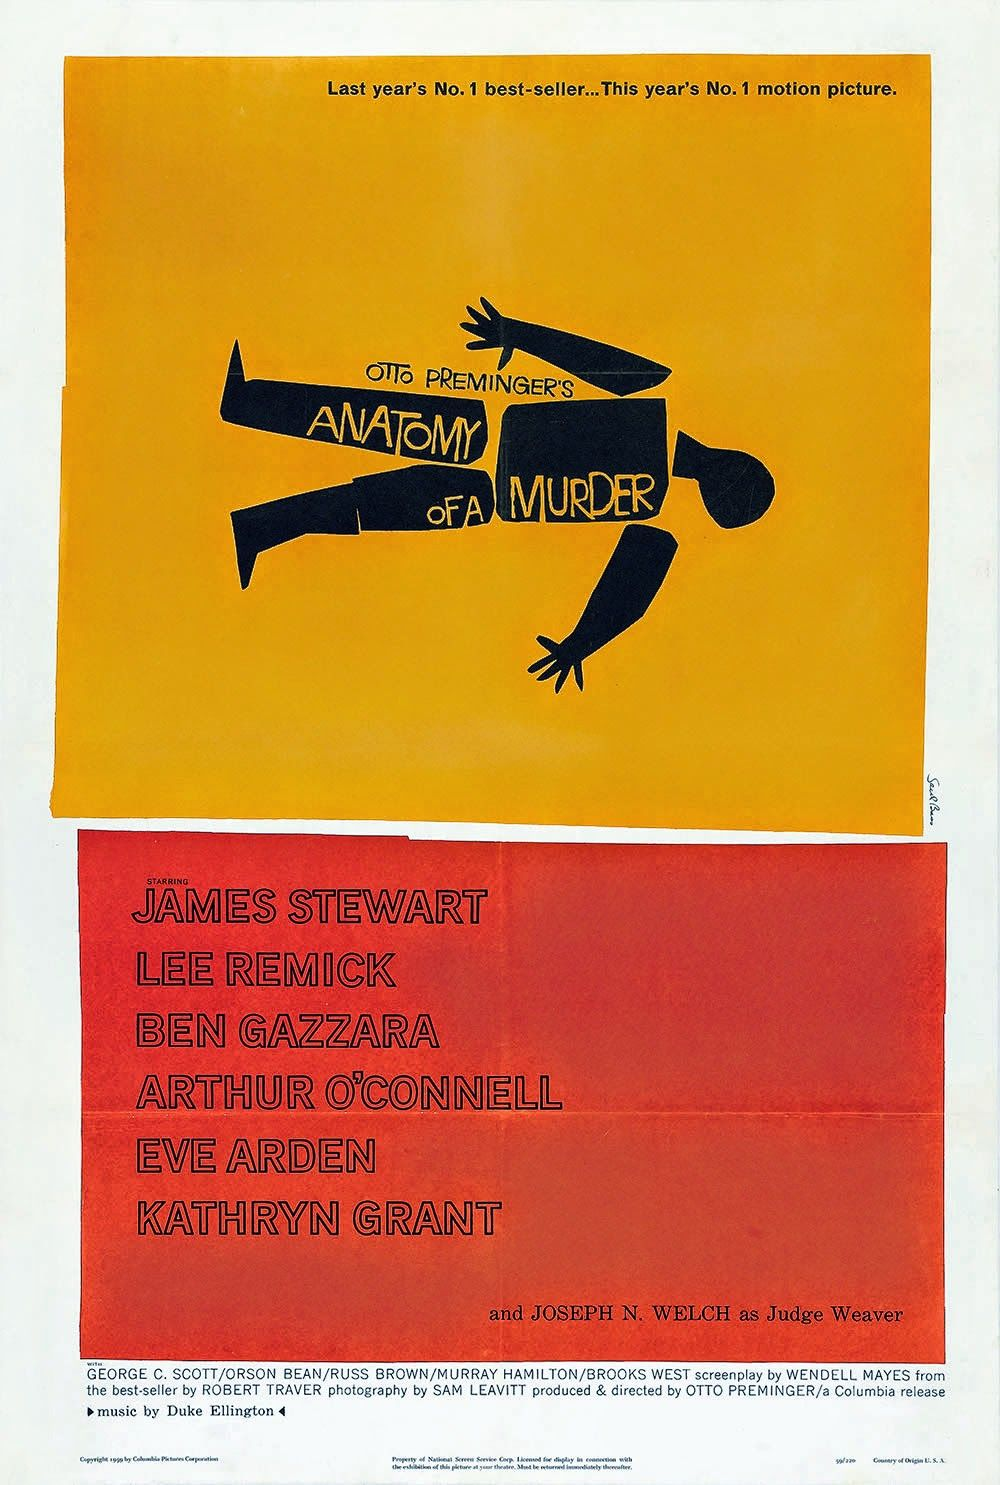 #SaulBass #AnatomyofaMurder #OttoPreminger #movieposters